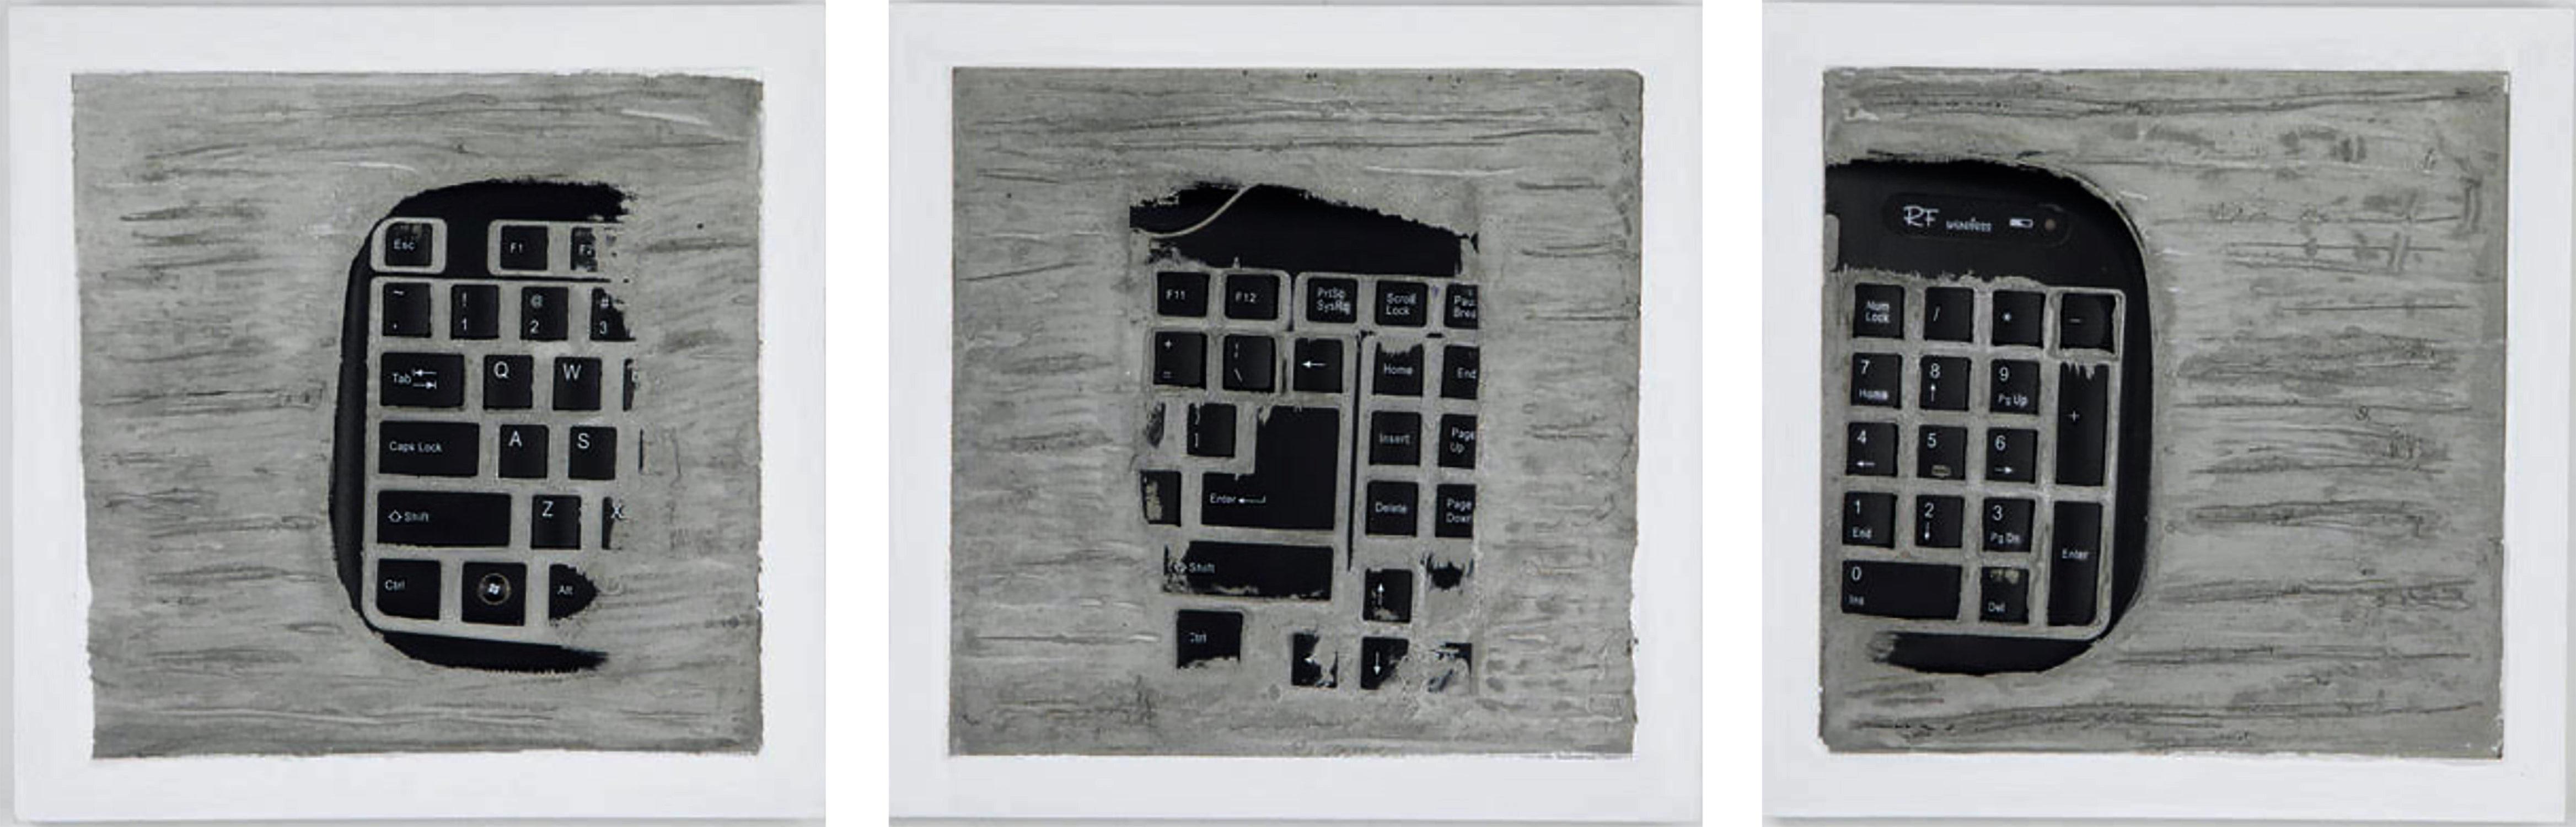 """Pen Decline 1 - 2 - 3 in Grey"" (Archeology series) Computer Keyboard Sculpture"